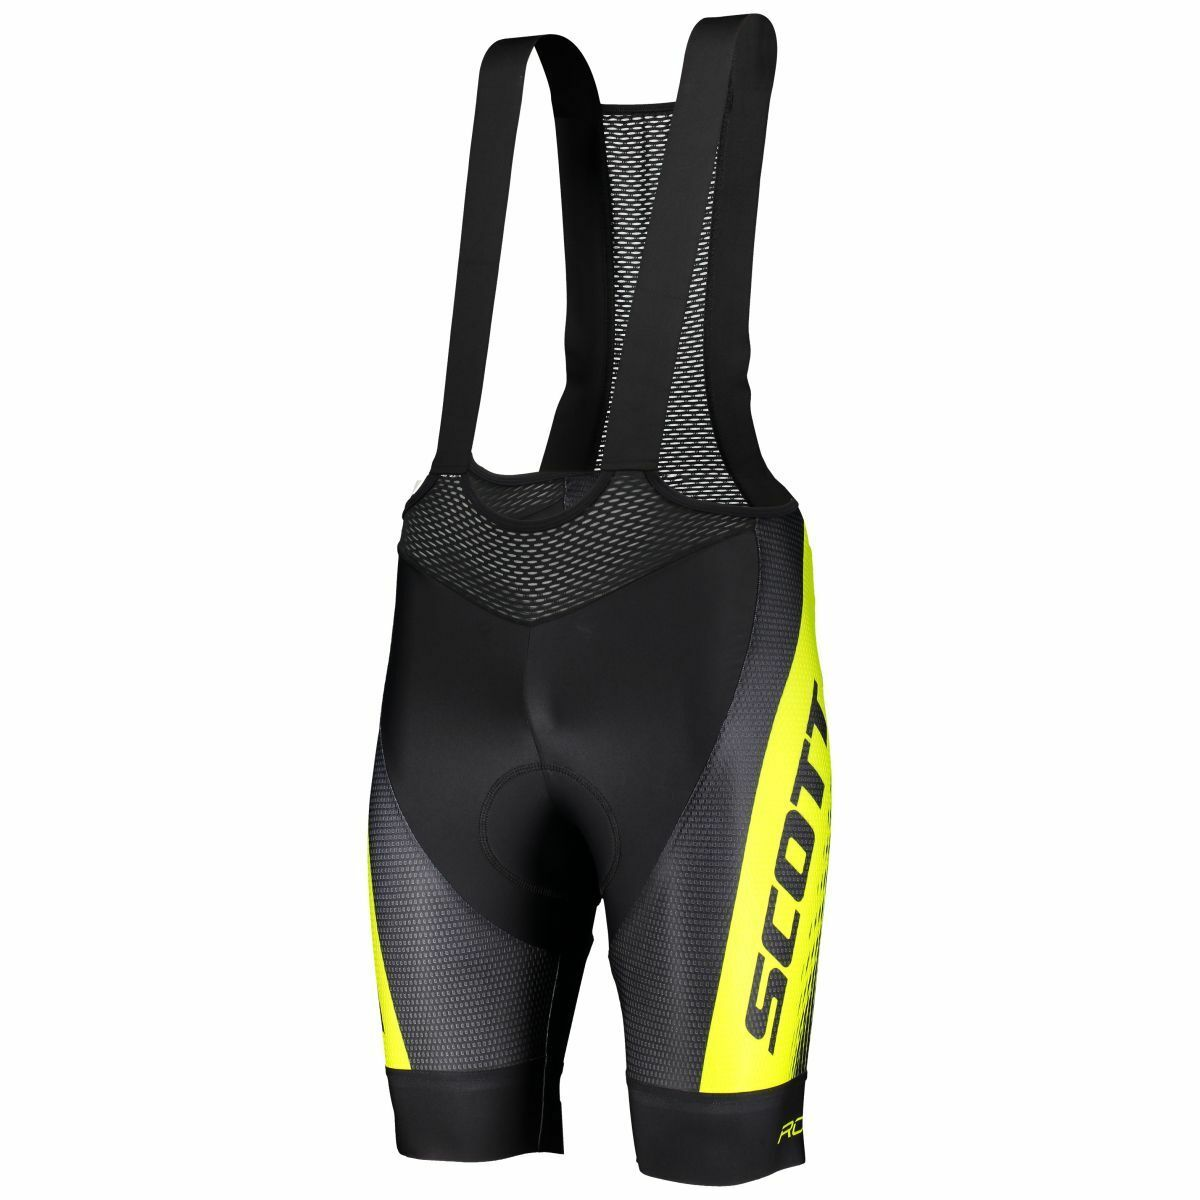 Scott RC Pro +++ Fahrrad Trägerhose kurz schwarz gelb 2019